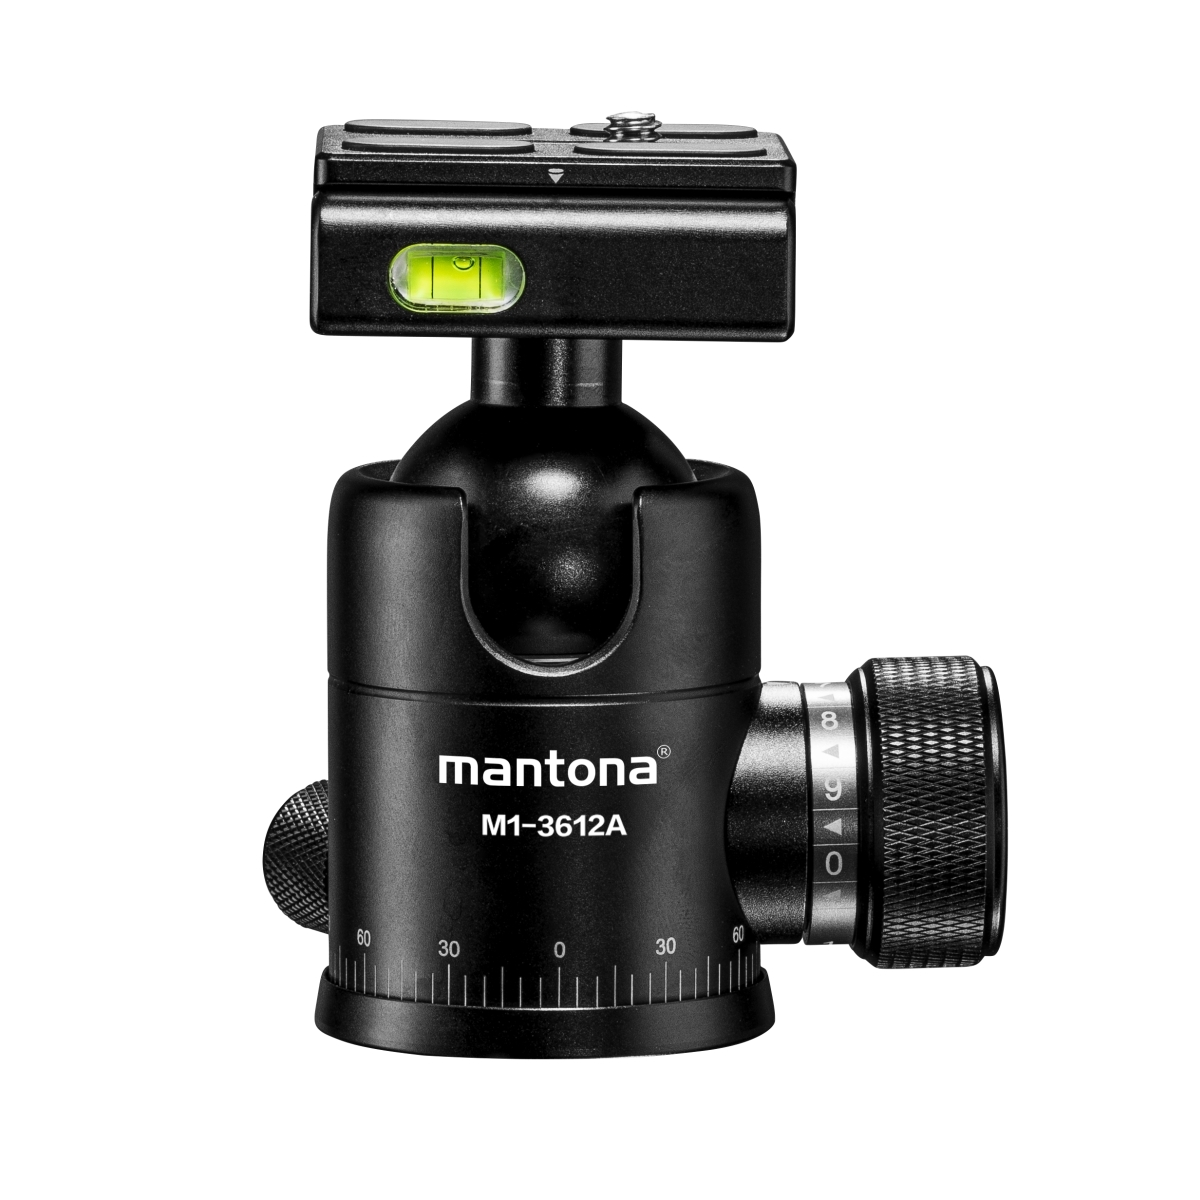 Mantona Onyx 12 ballhead (M1-3612A)